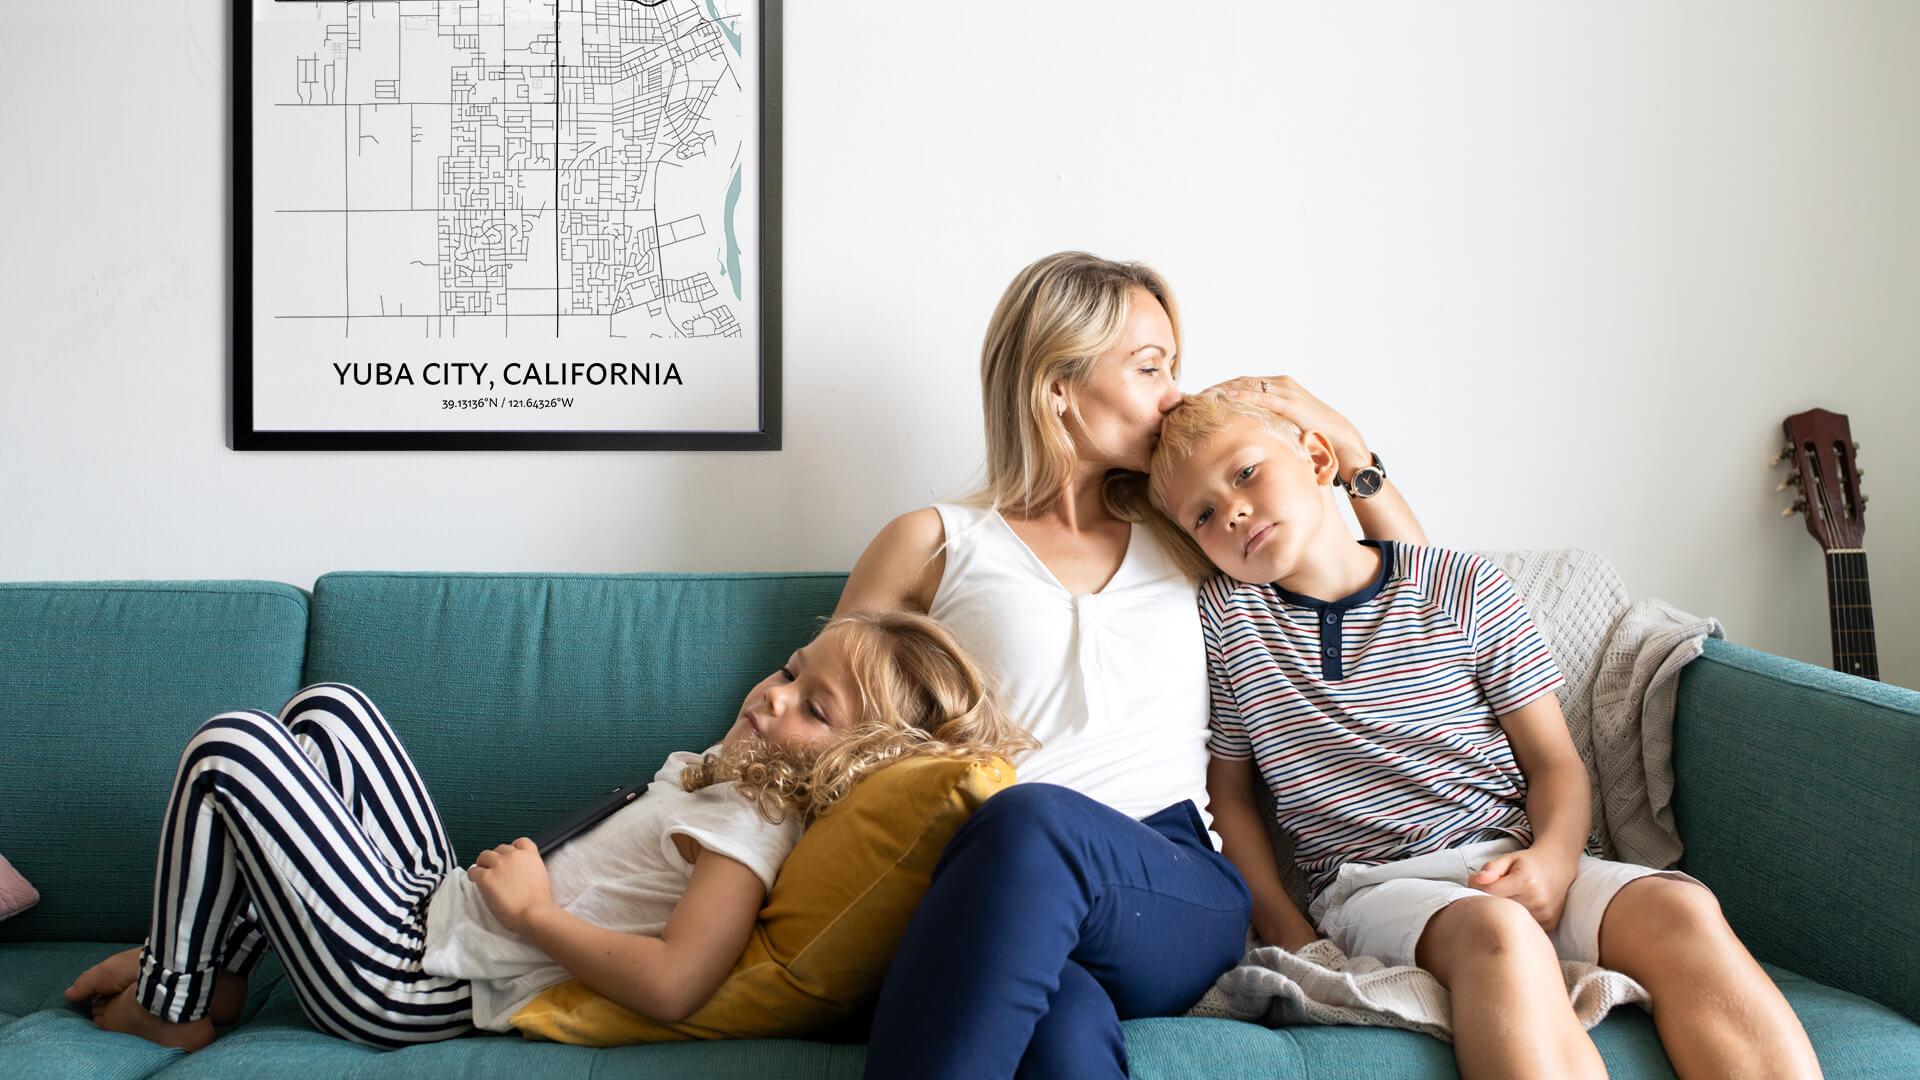 Yuba City map poster